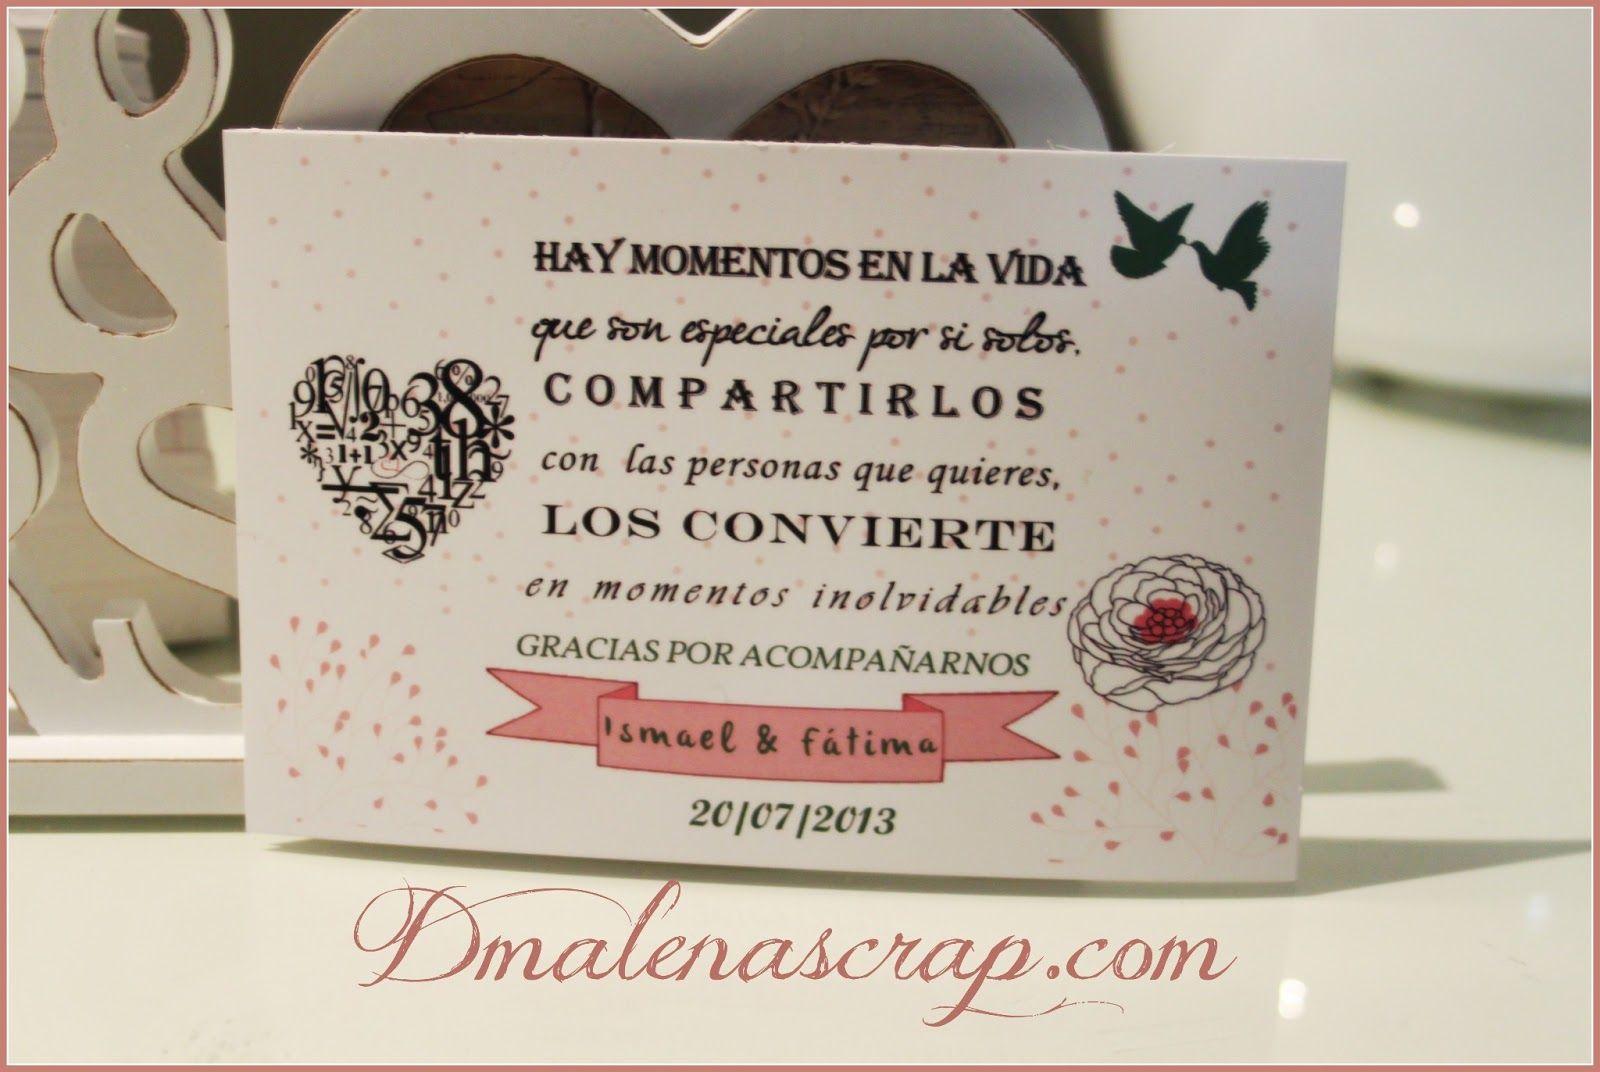 dmalena+tarjetas+de+agradecimiento.jpg 1,600×1,072 pixeles   Agradecimiento  boda, Carta de agradecimiento, Palabras de agradecimiento